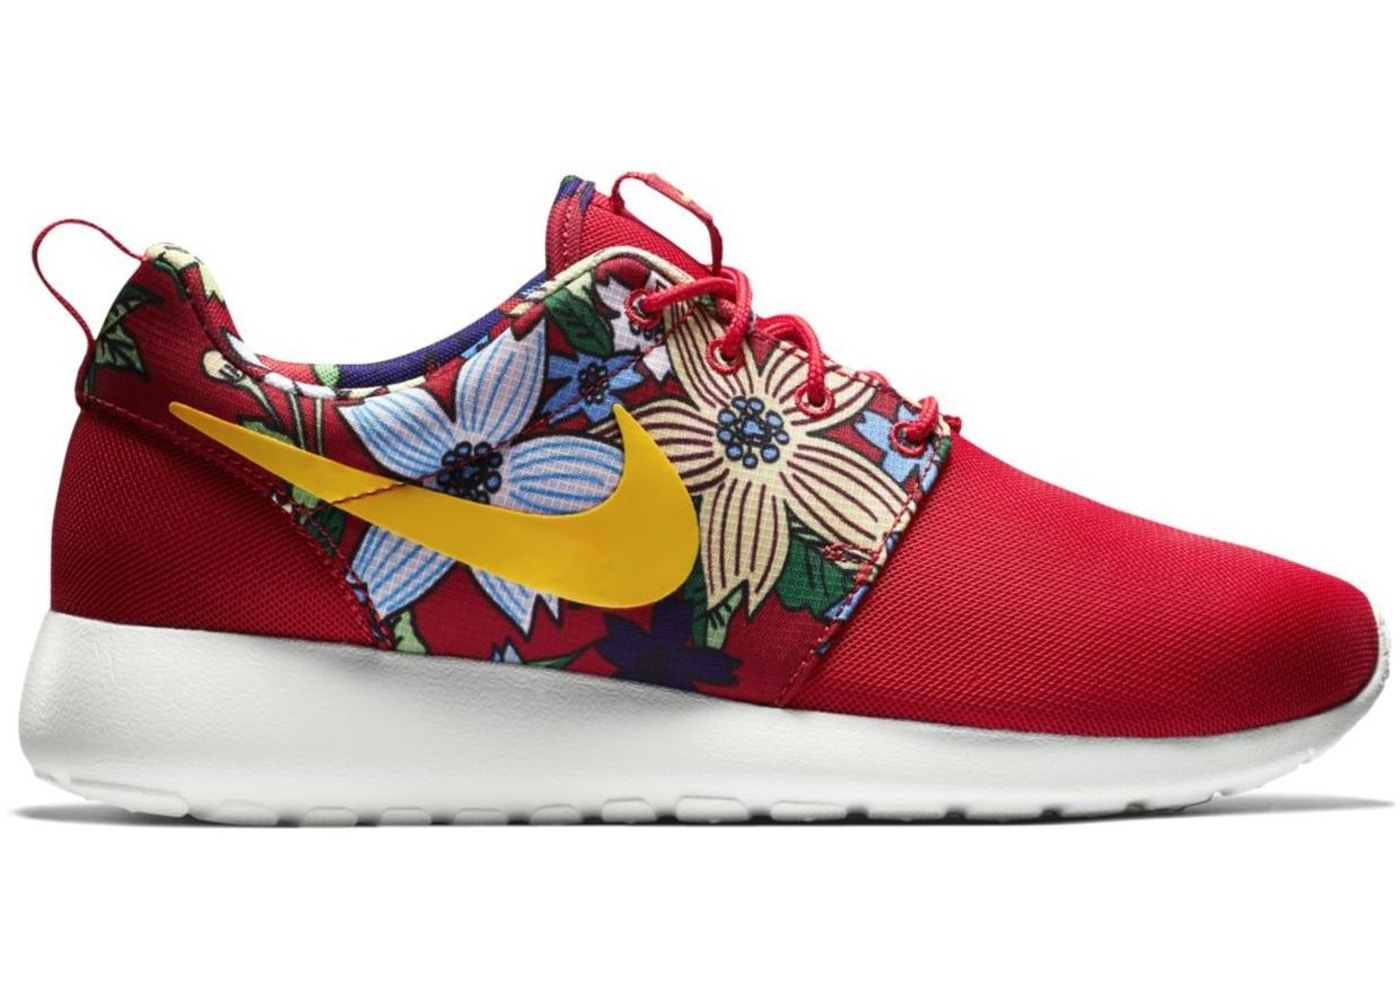 super popular 073f2 0cb34 Nike Roshe Run Red Floral Aloha (GS) - 599432-674